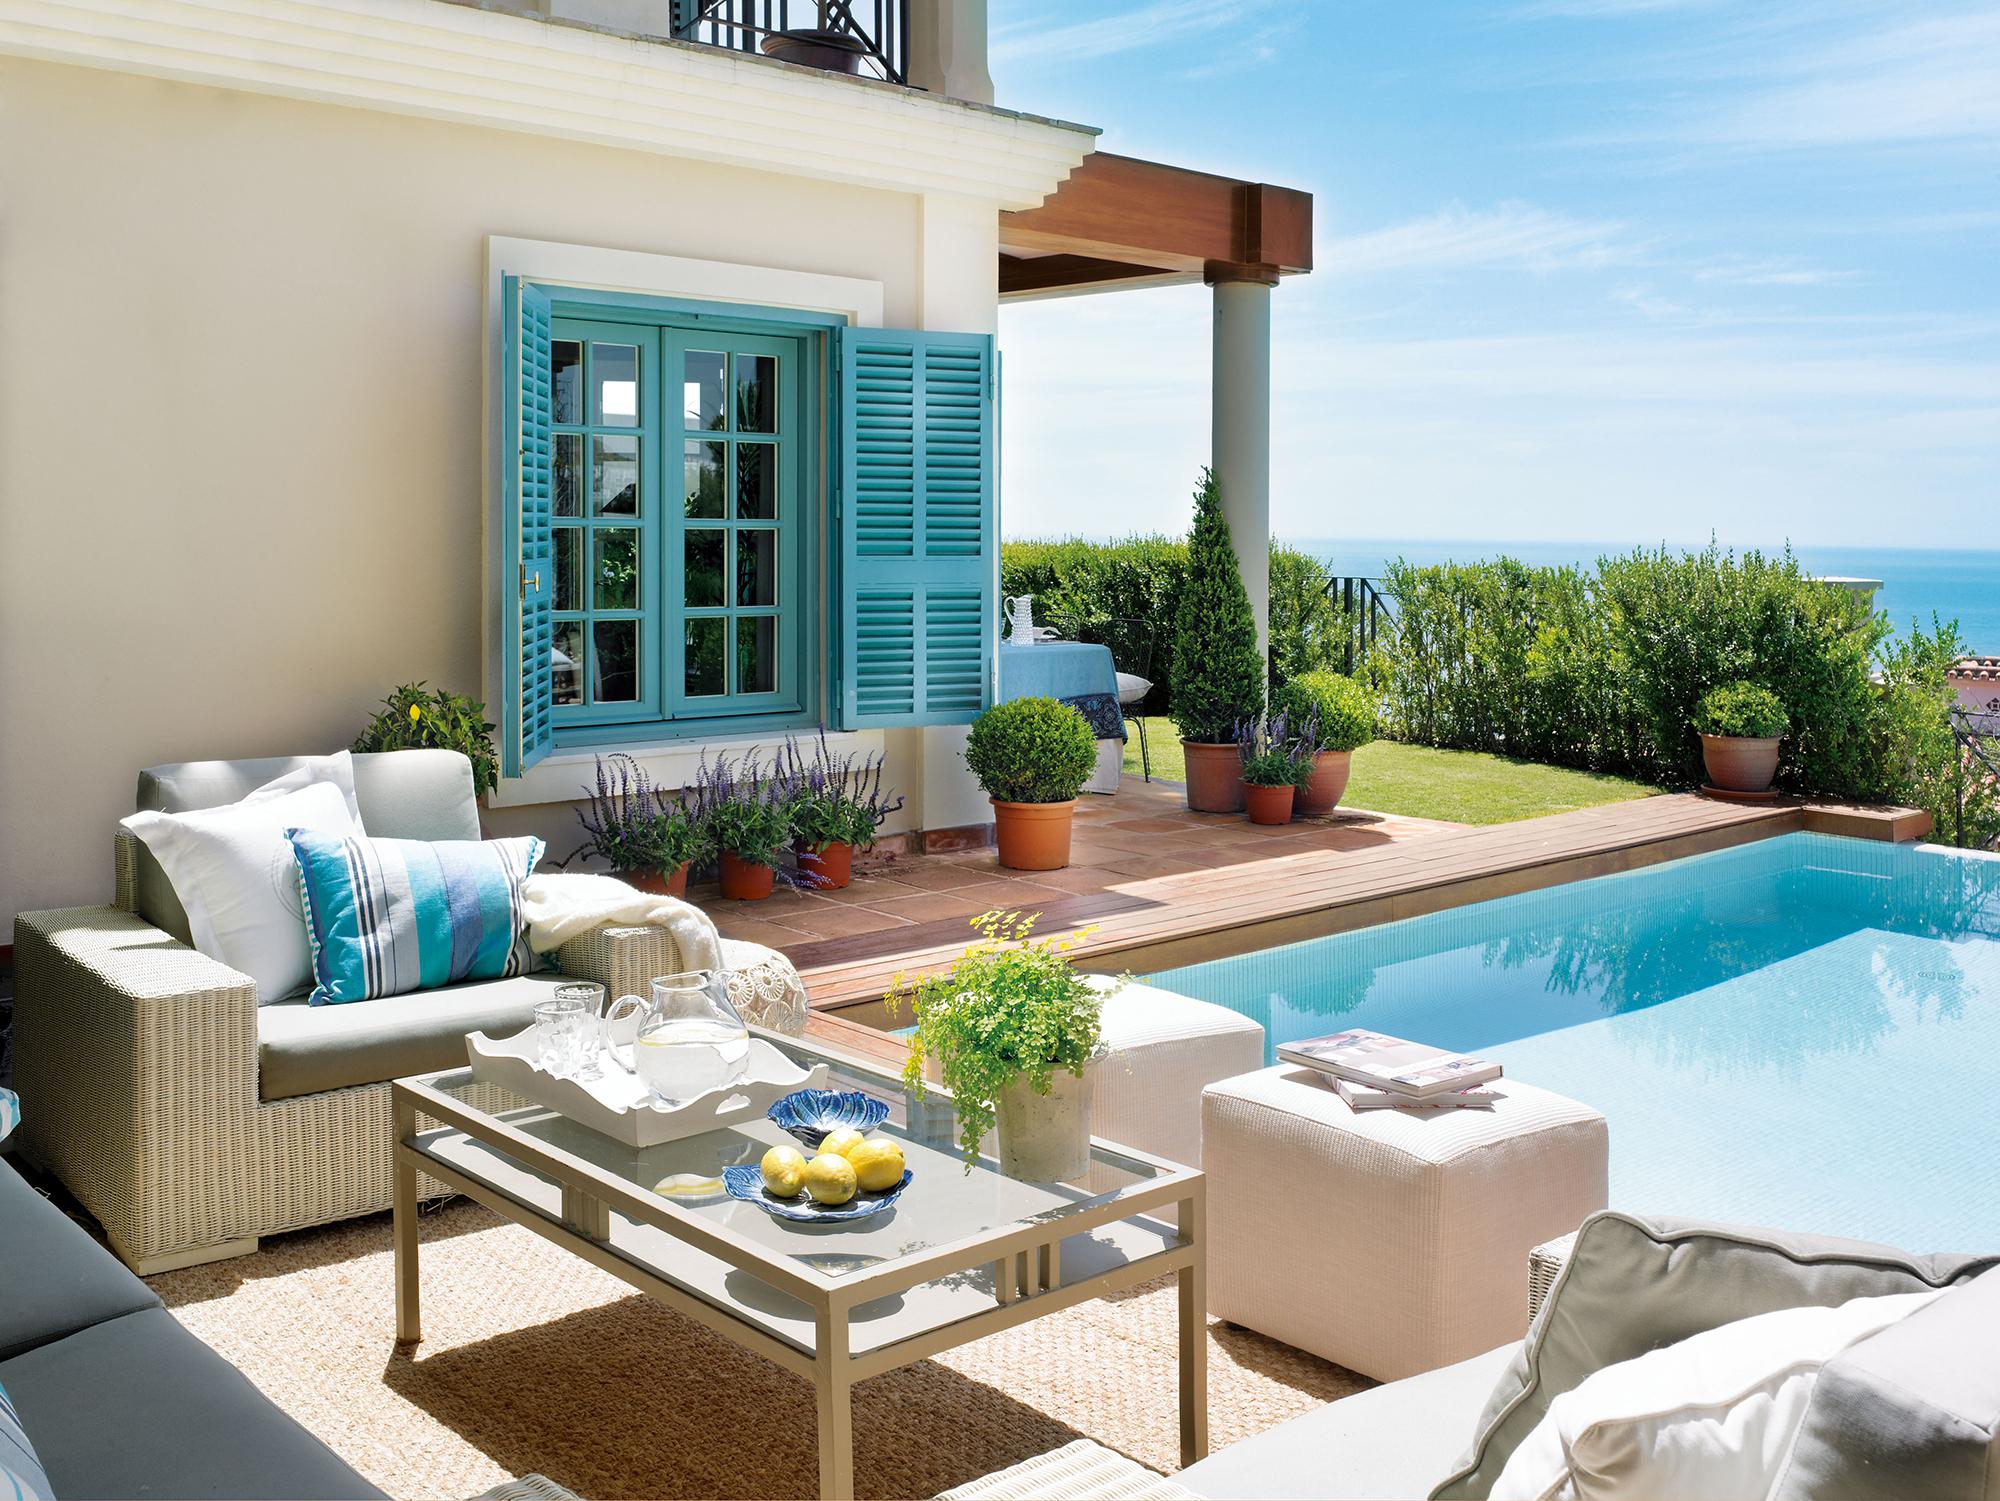 Terrazas muebles mesas e ideas para tu terraza el mueble for Patios interiores con piscina